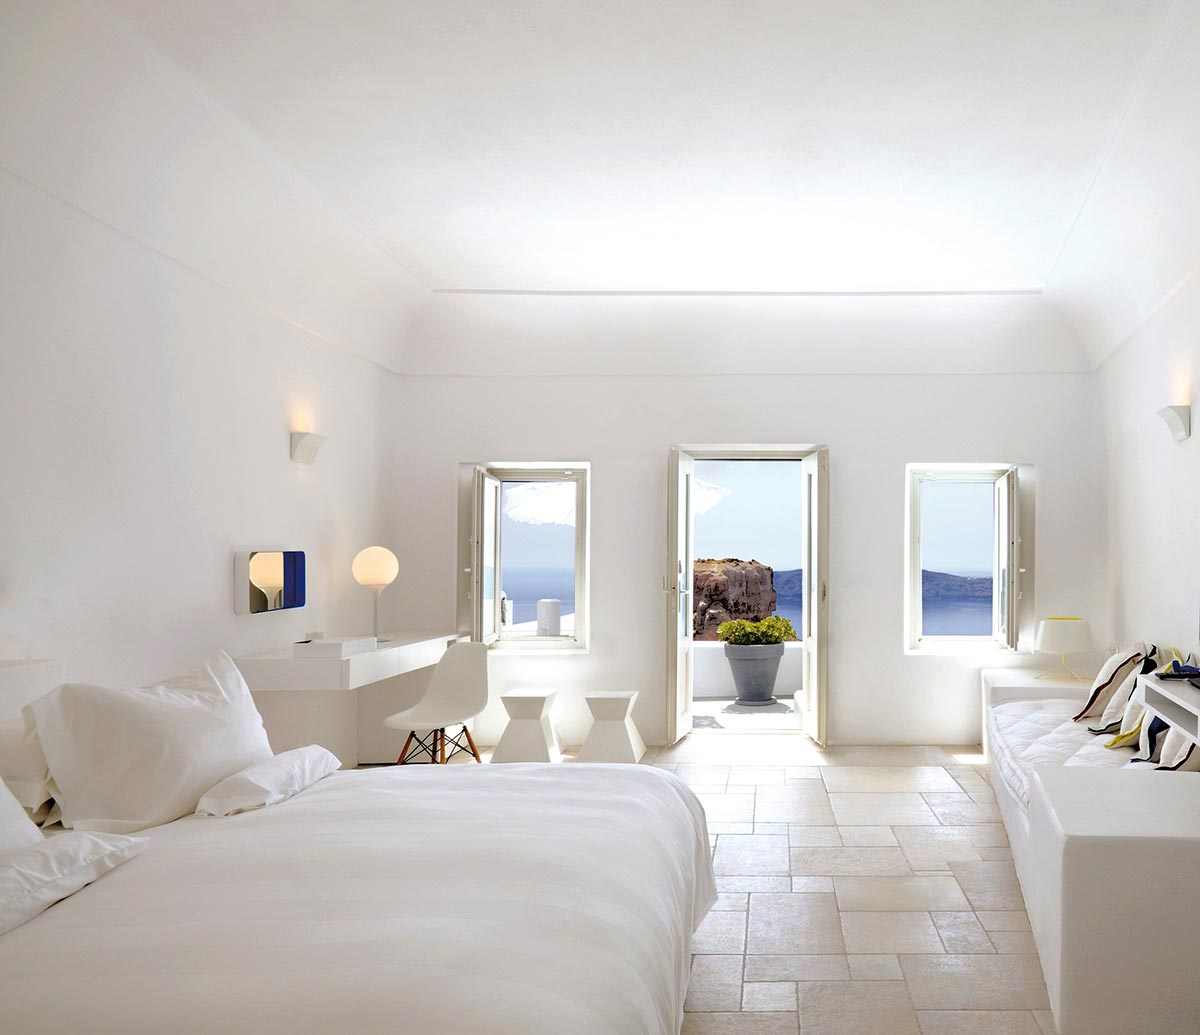 Exklusives Boutique Hotel: Grace in Santorini, Greece 5